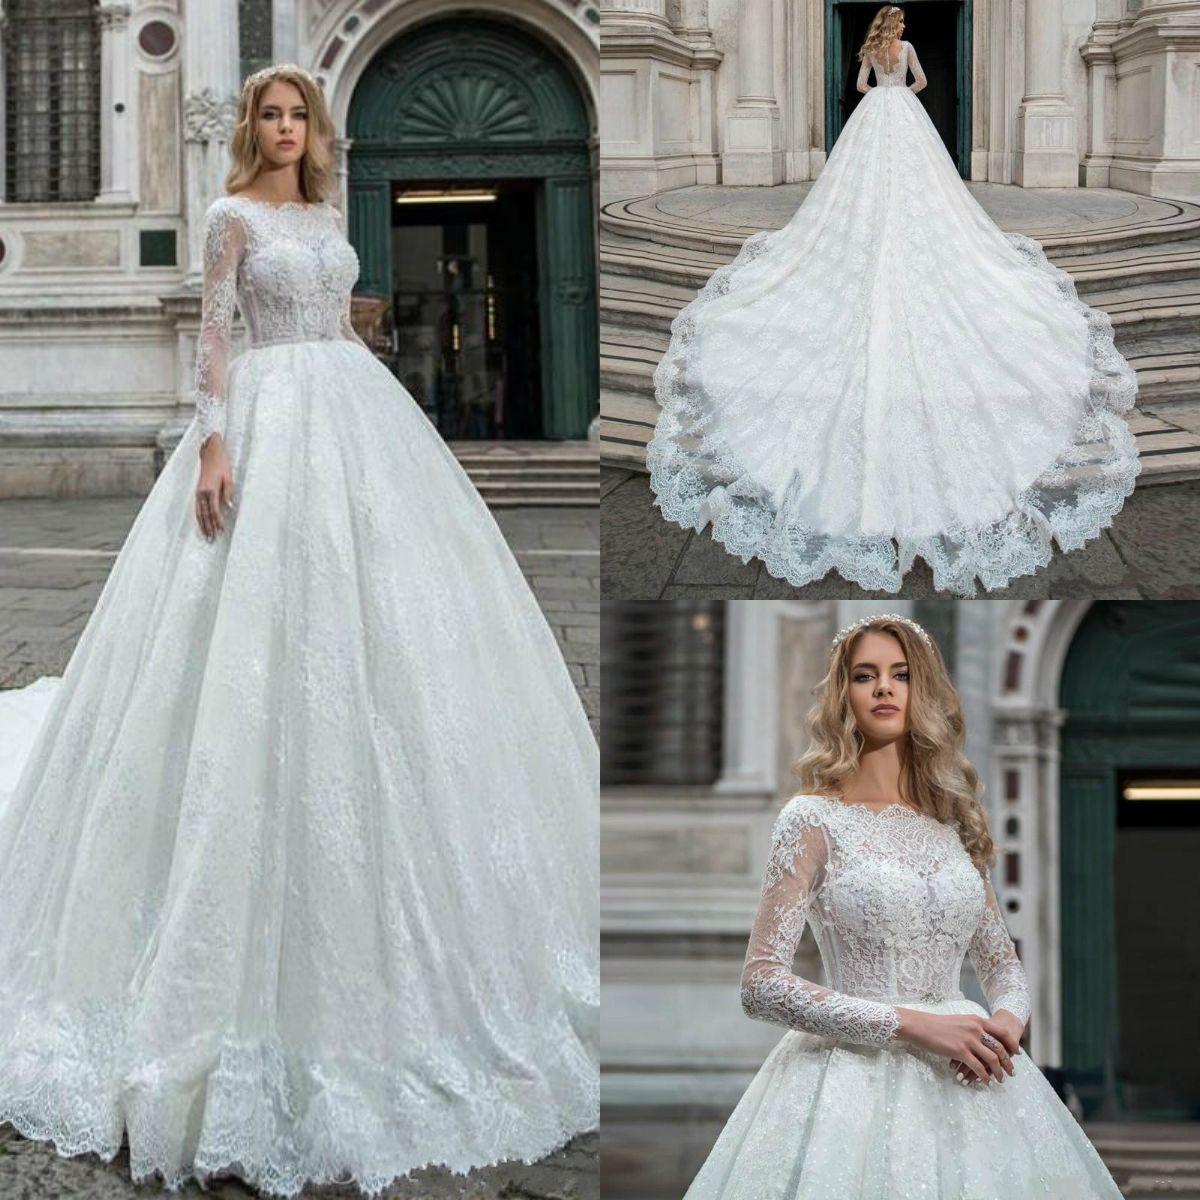 2019 Princess Gorgeous Ball Gown Wedding Dresses Long Sleeve Bridal ... 82946ab1f164